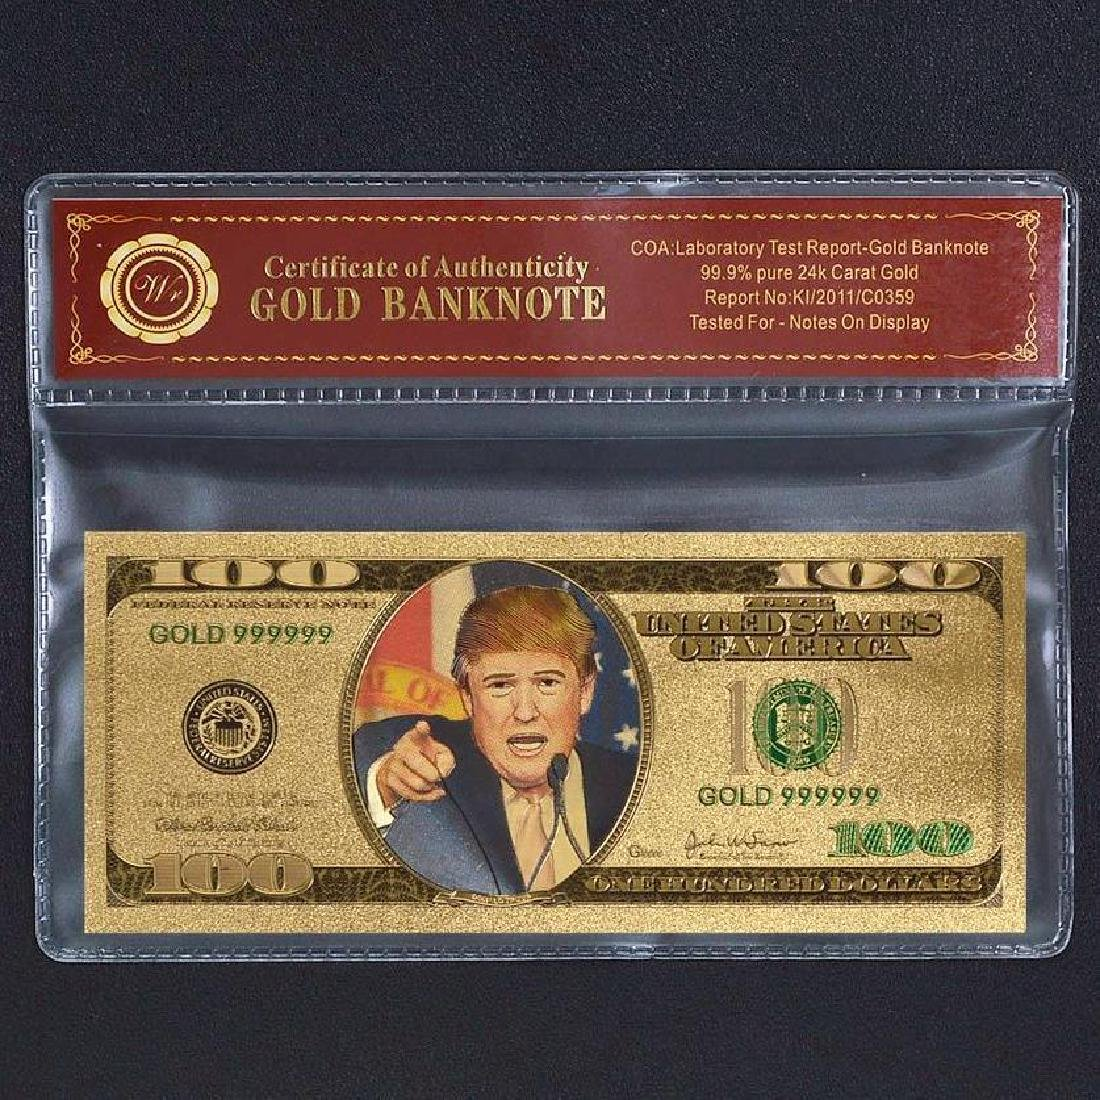 Donald Trump $100 Colored 24K Gold Clad Banknote